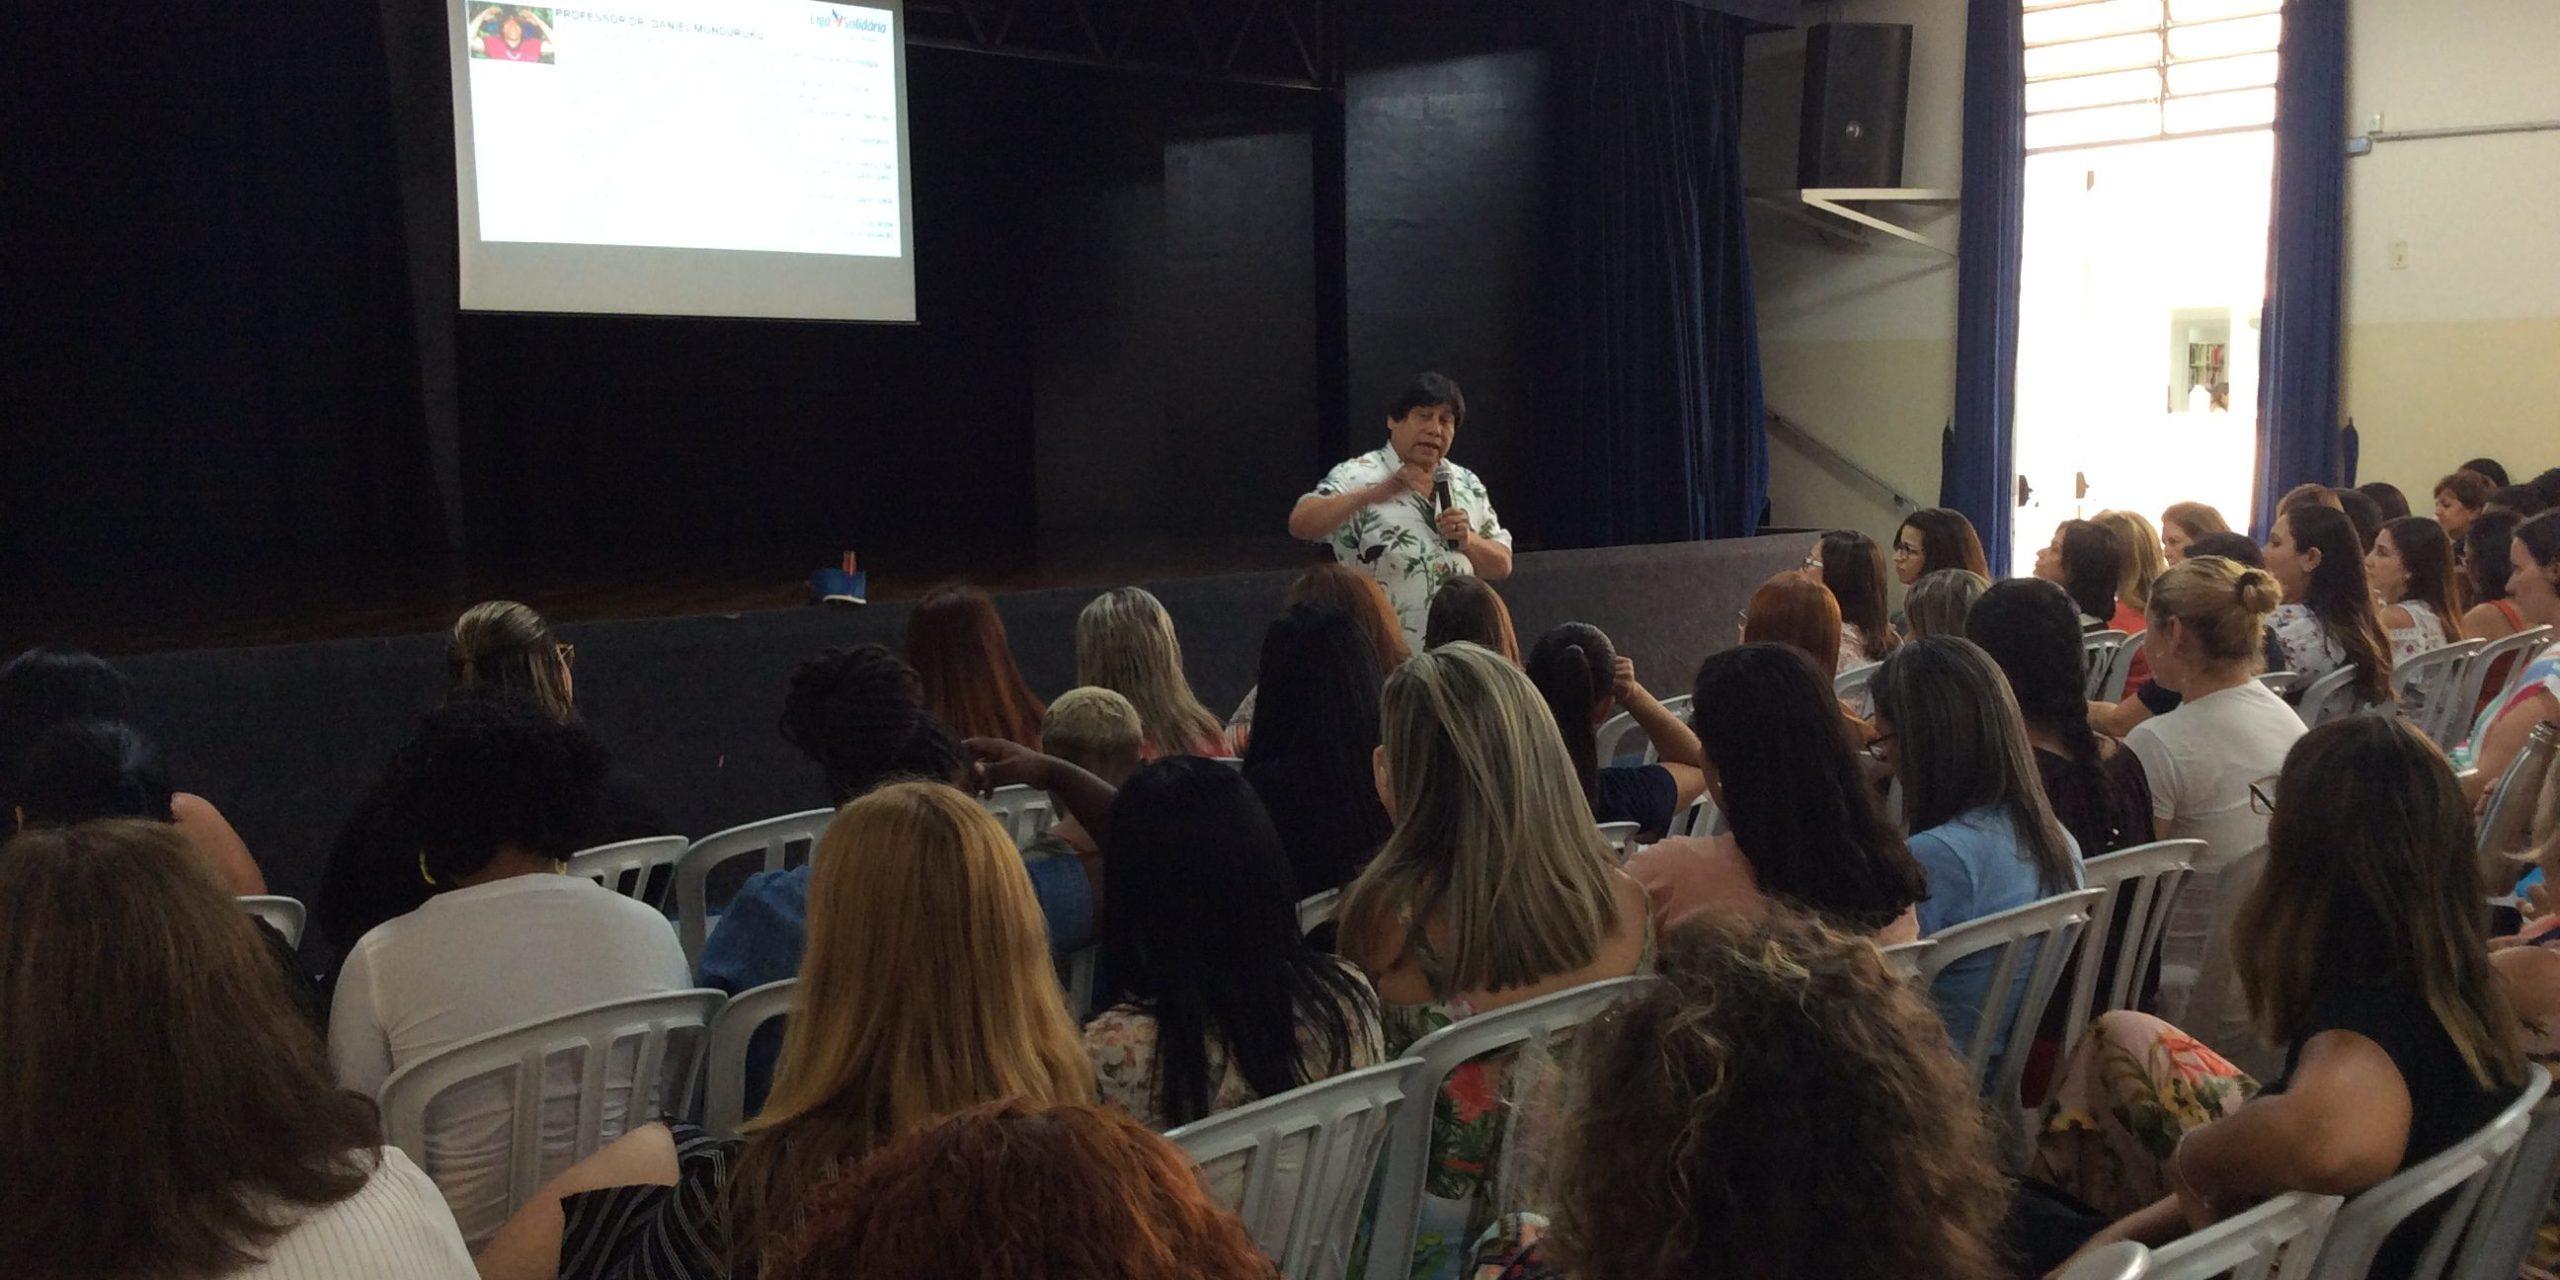 Palestra sobre Diversidade Cultural e Linguística Brasileira